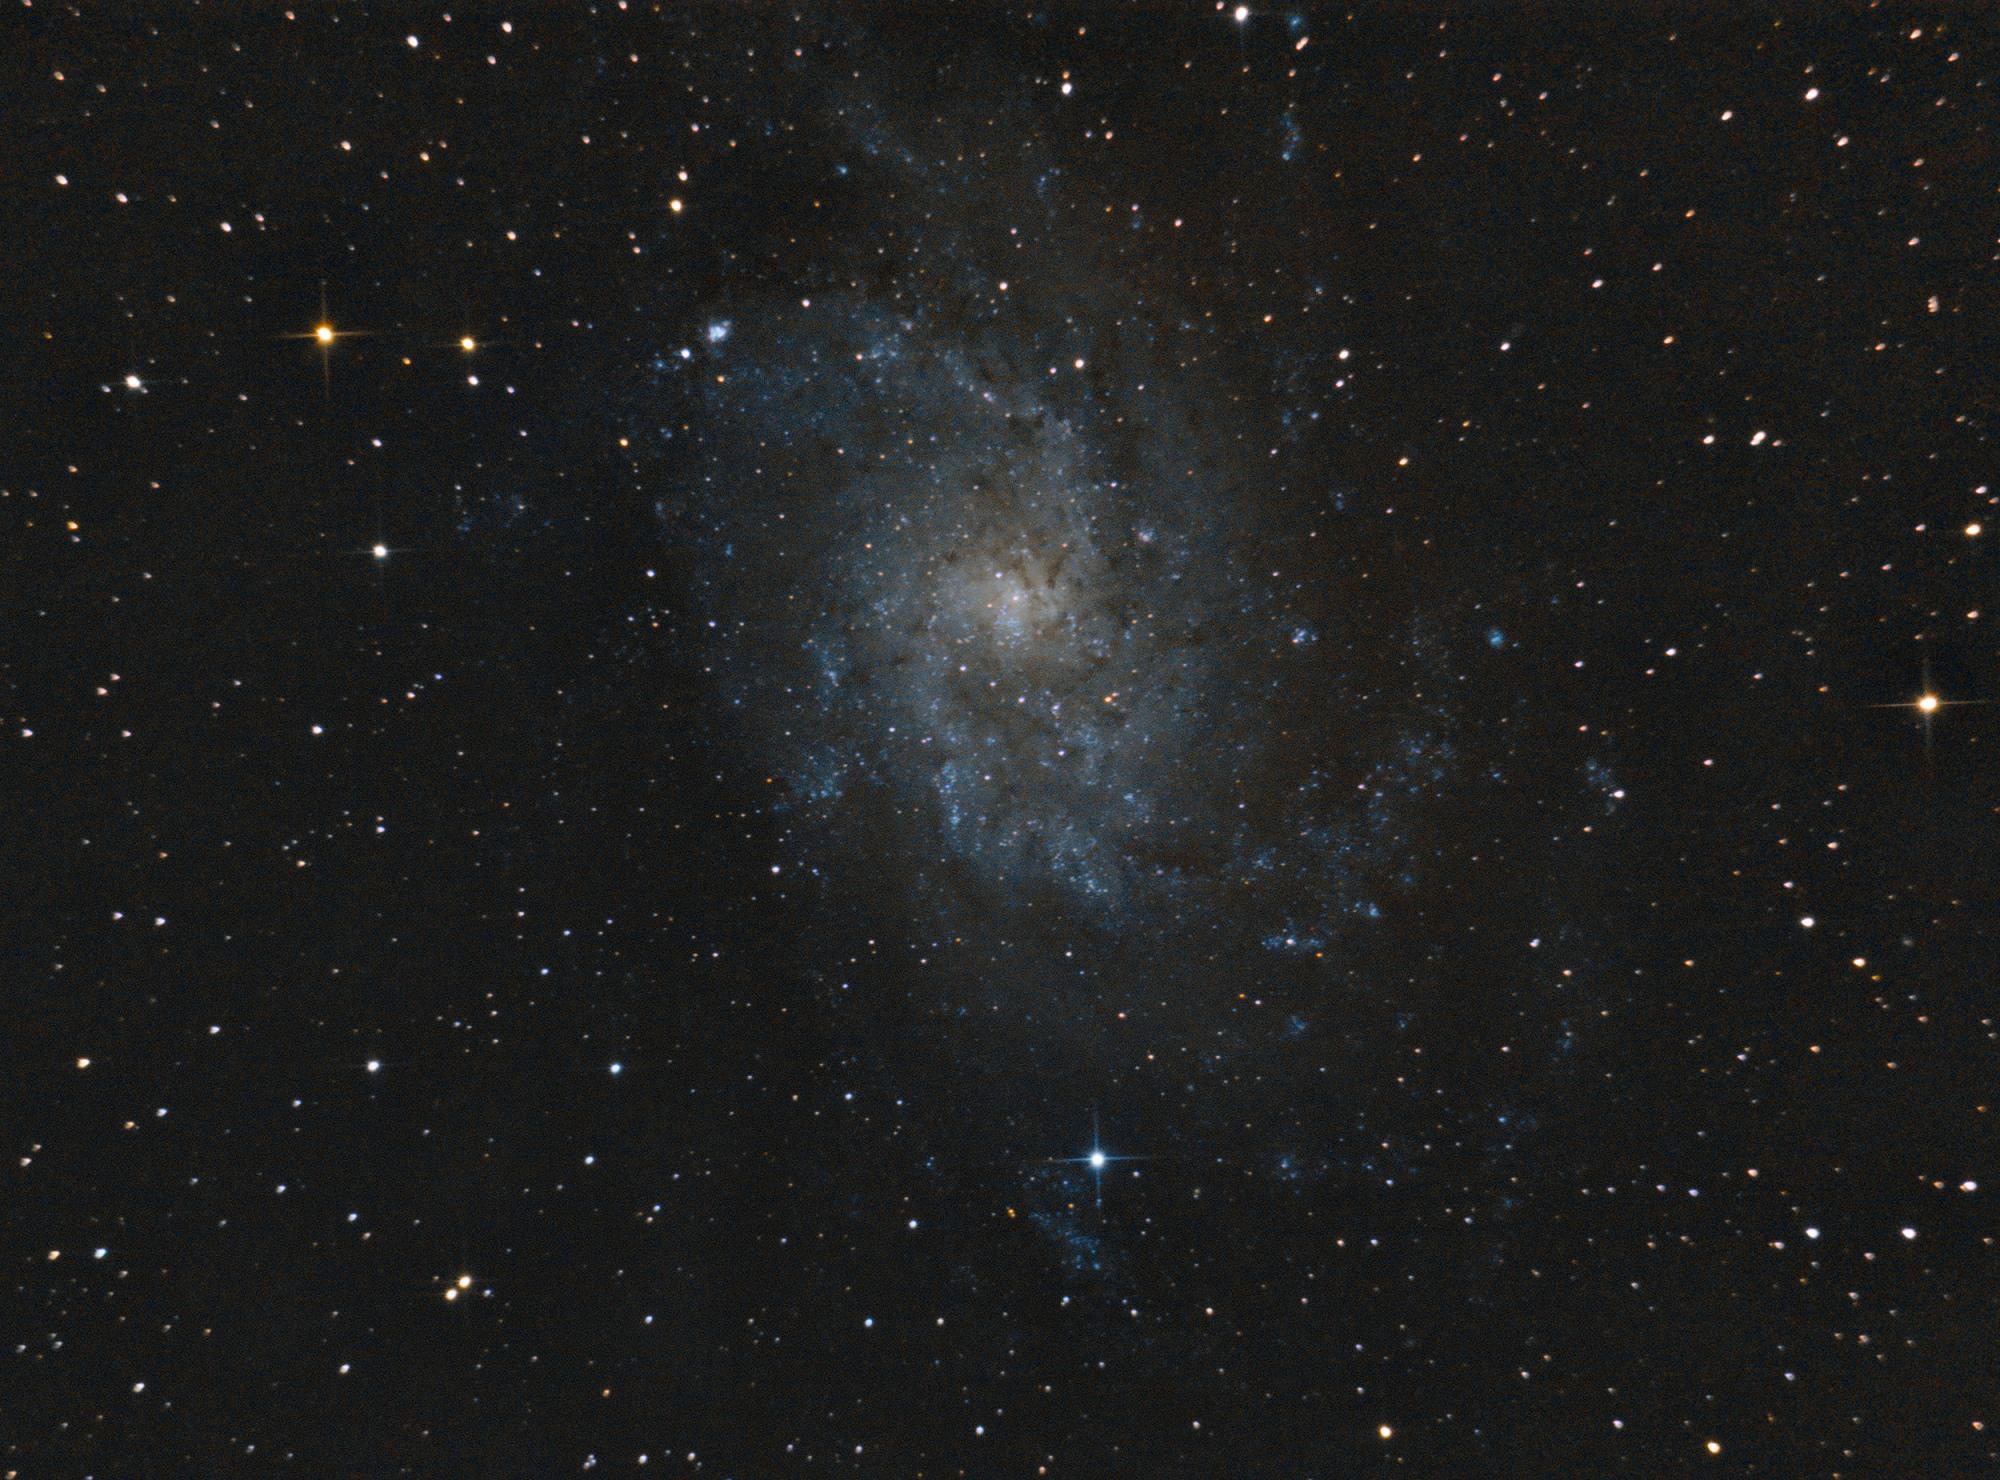 M33.thumb.jpg.987de24d55badc204a99574d0a055891.jpg